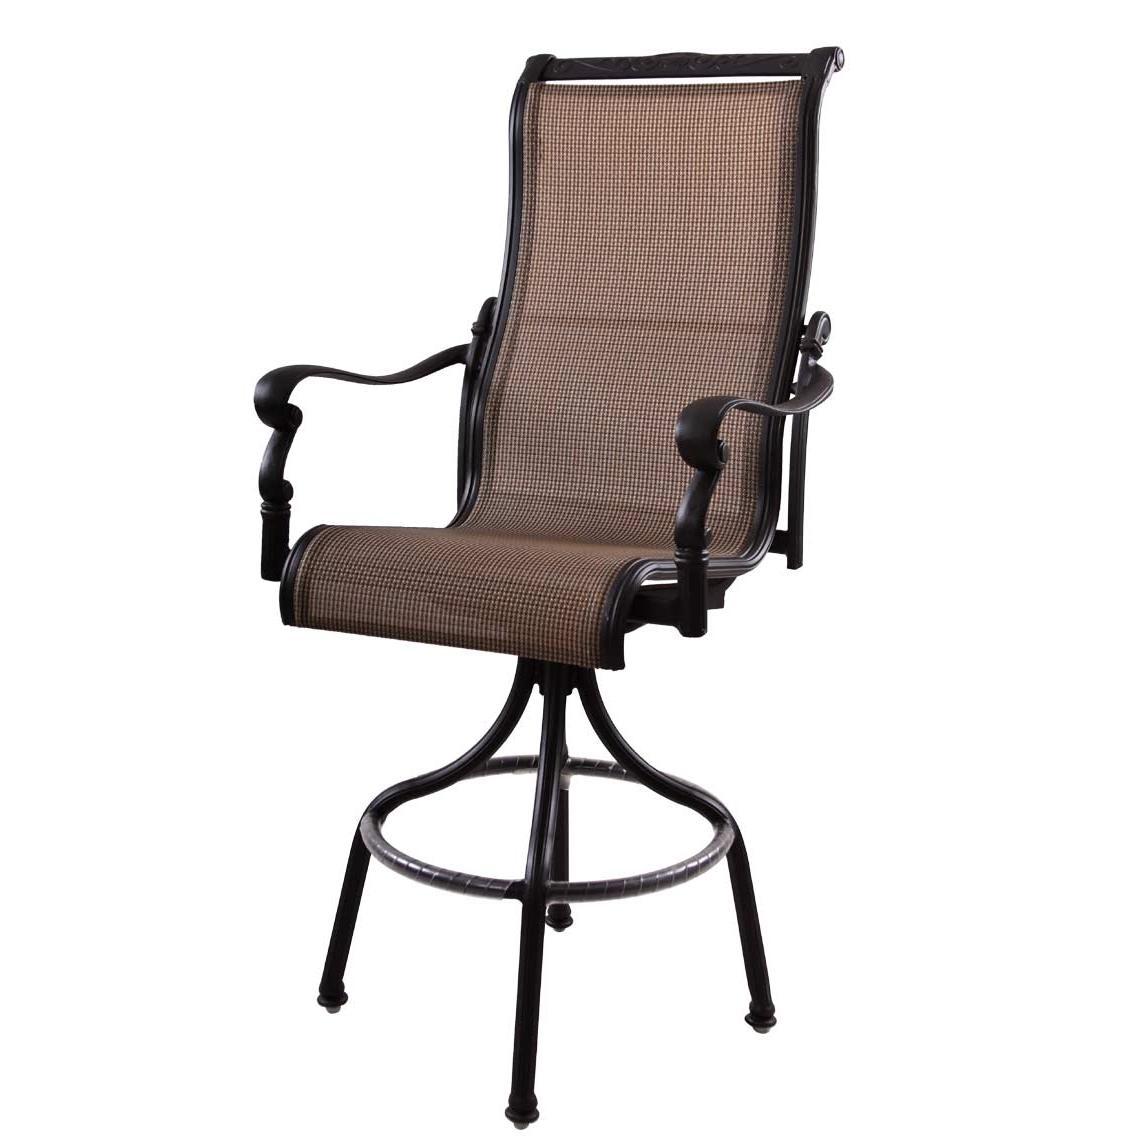 Patio Furniture Aluminum/Sling Pub Chair High Back Swivel